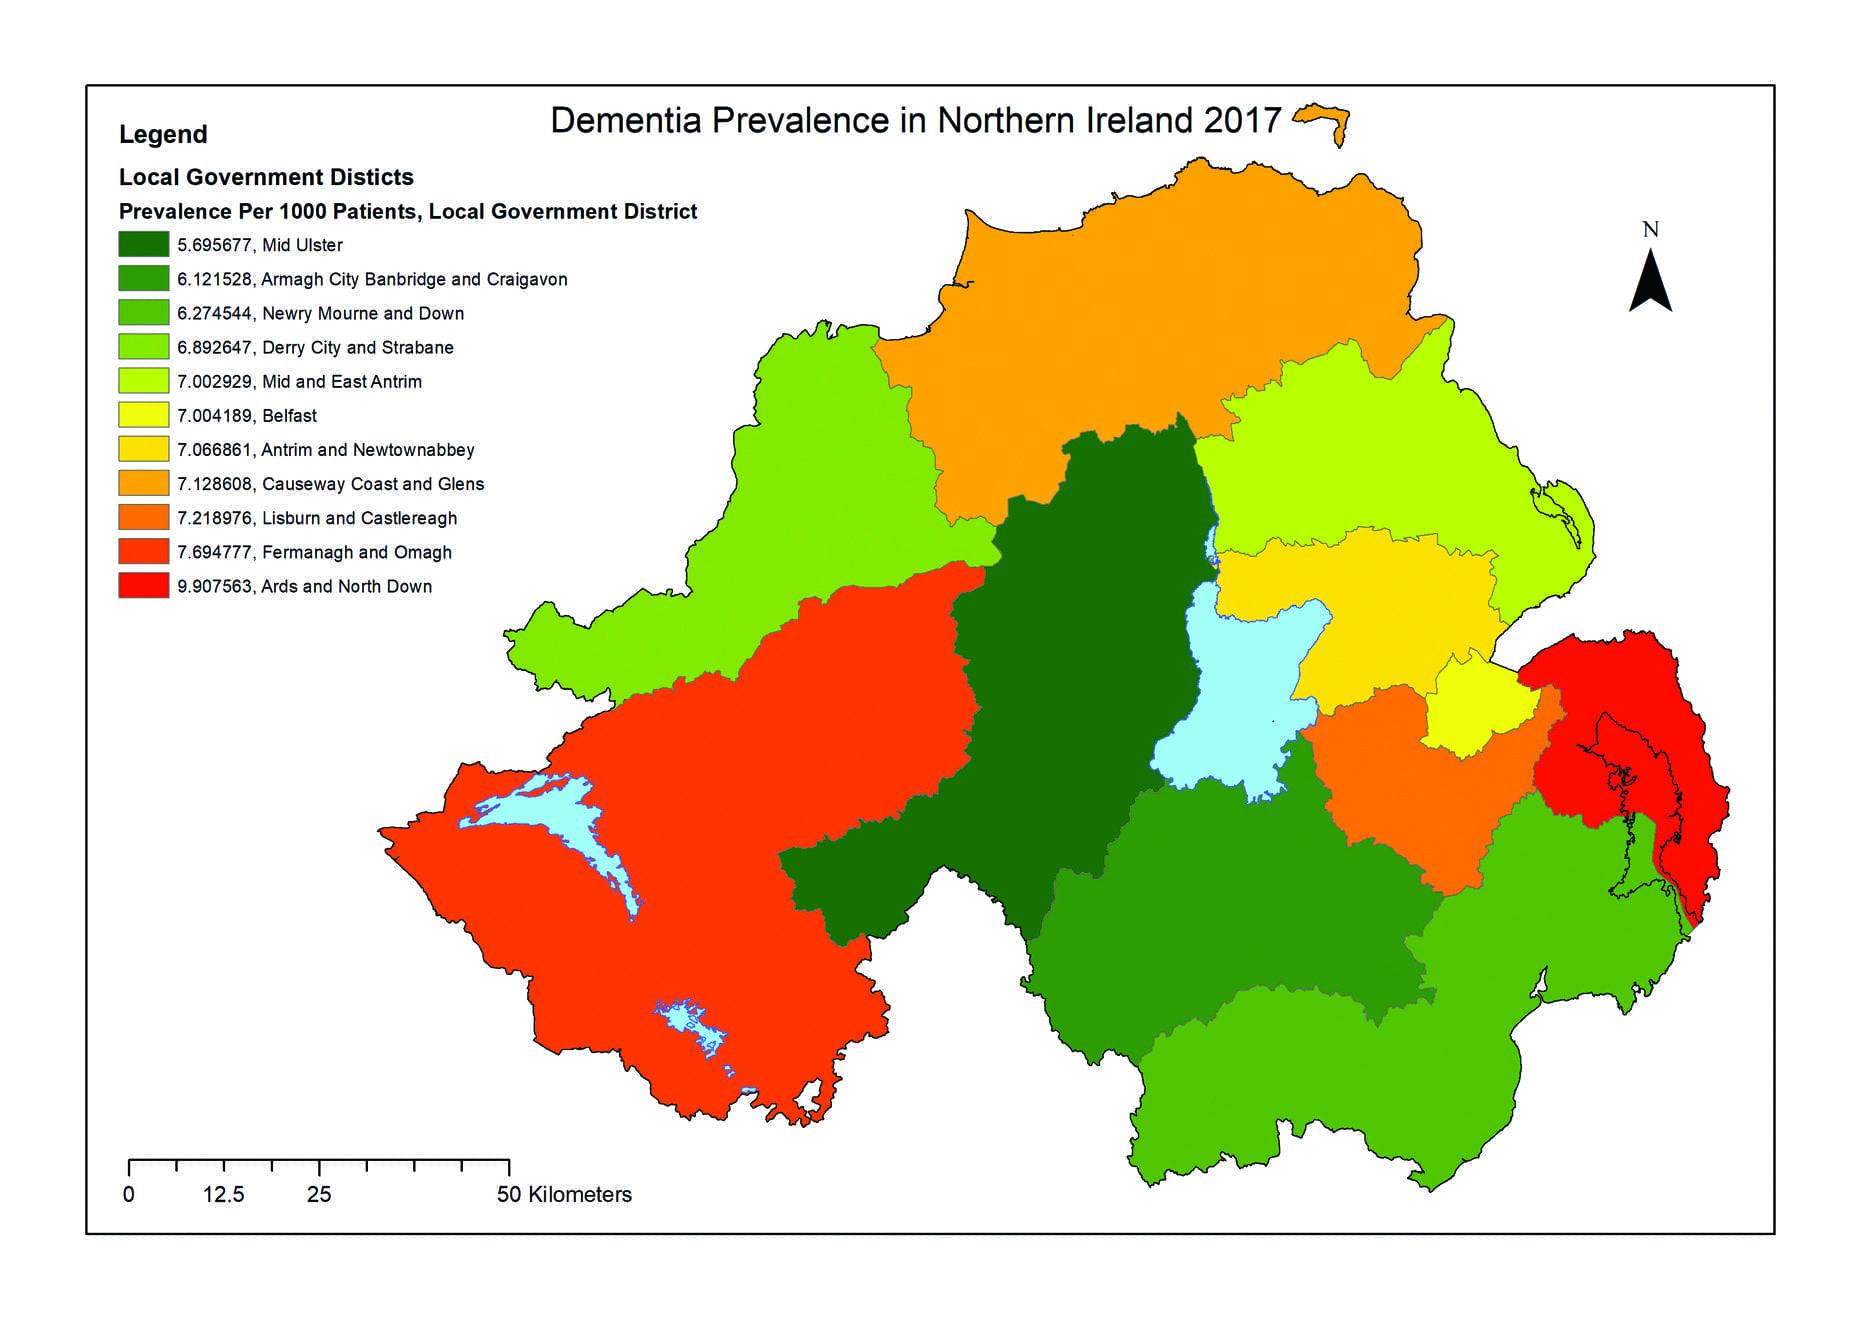 Borough tops the dementia table